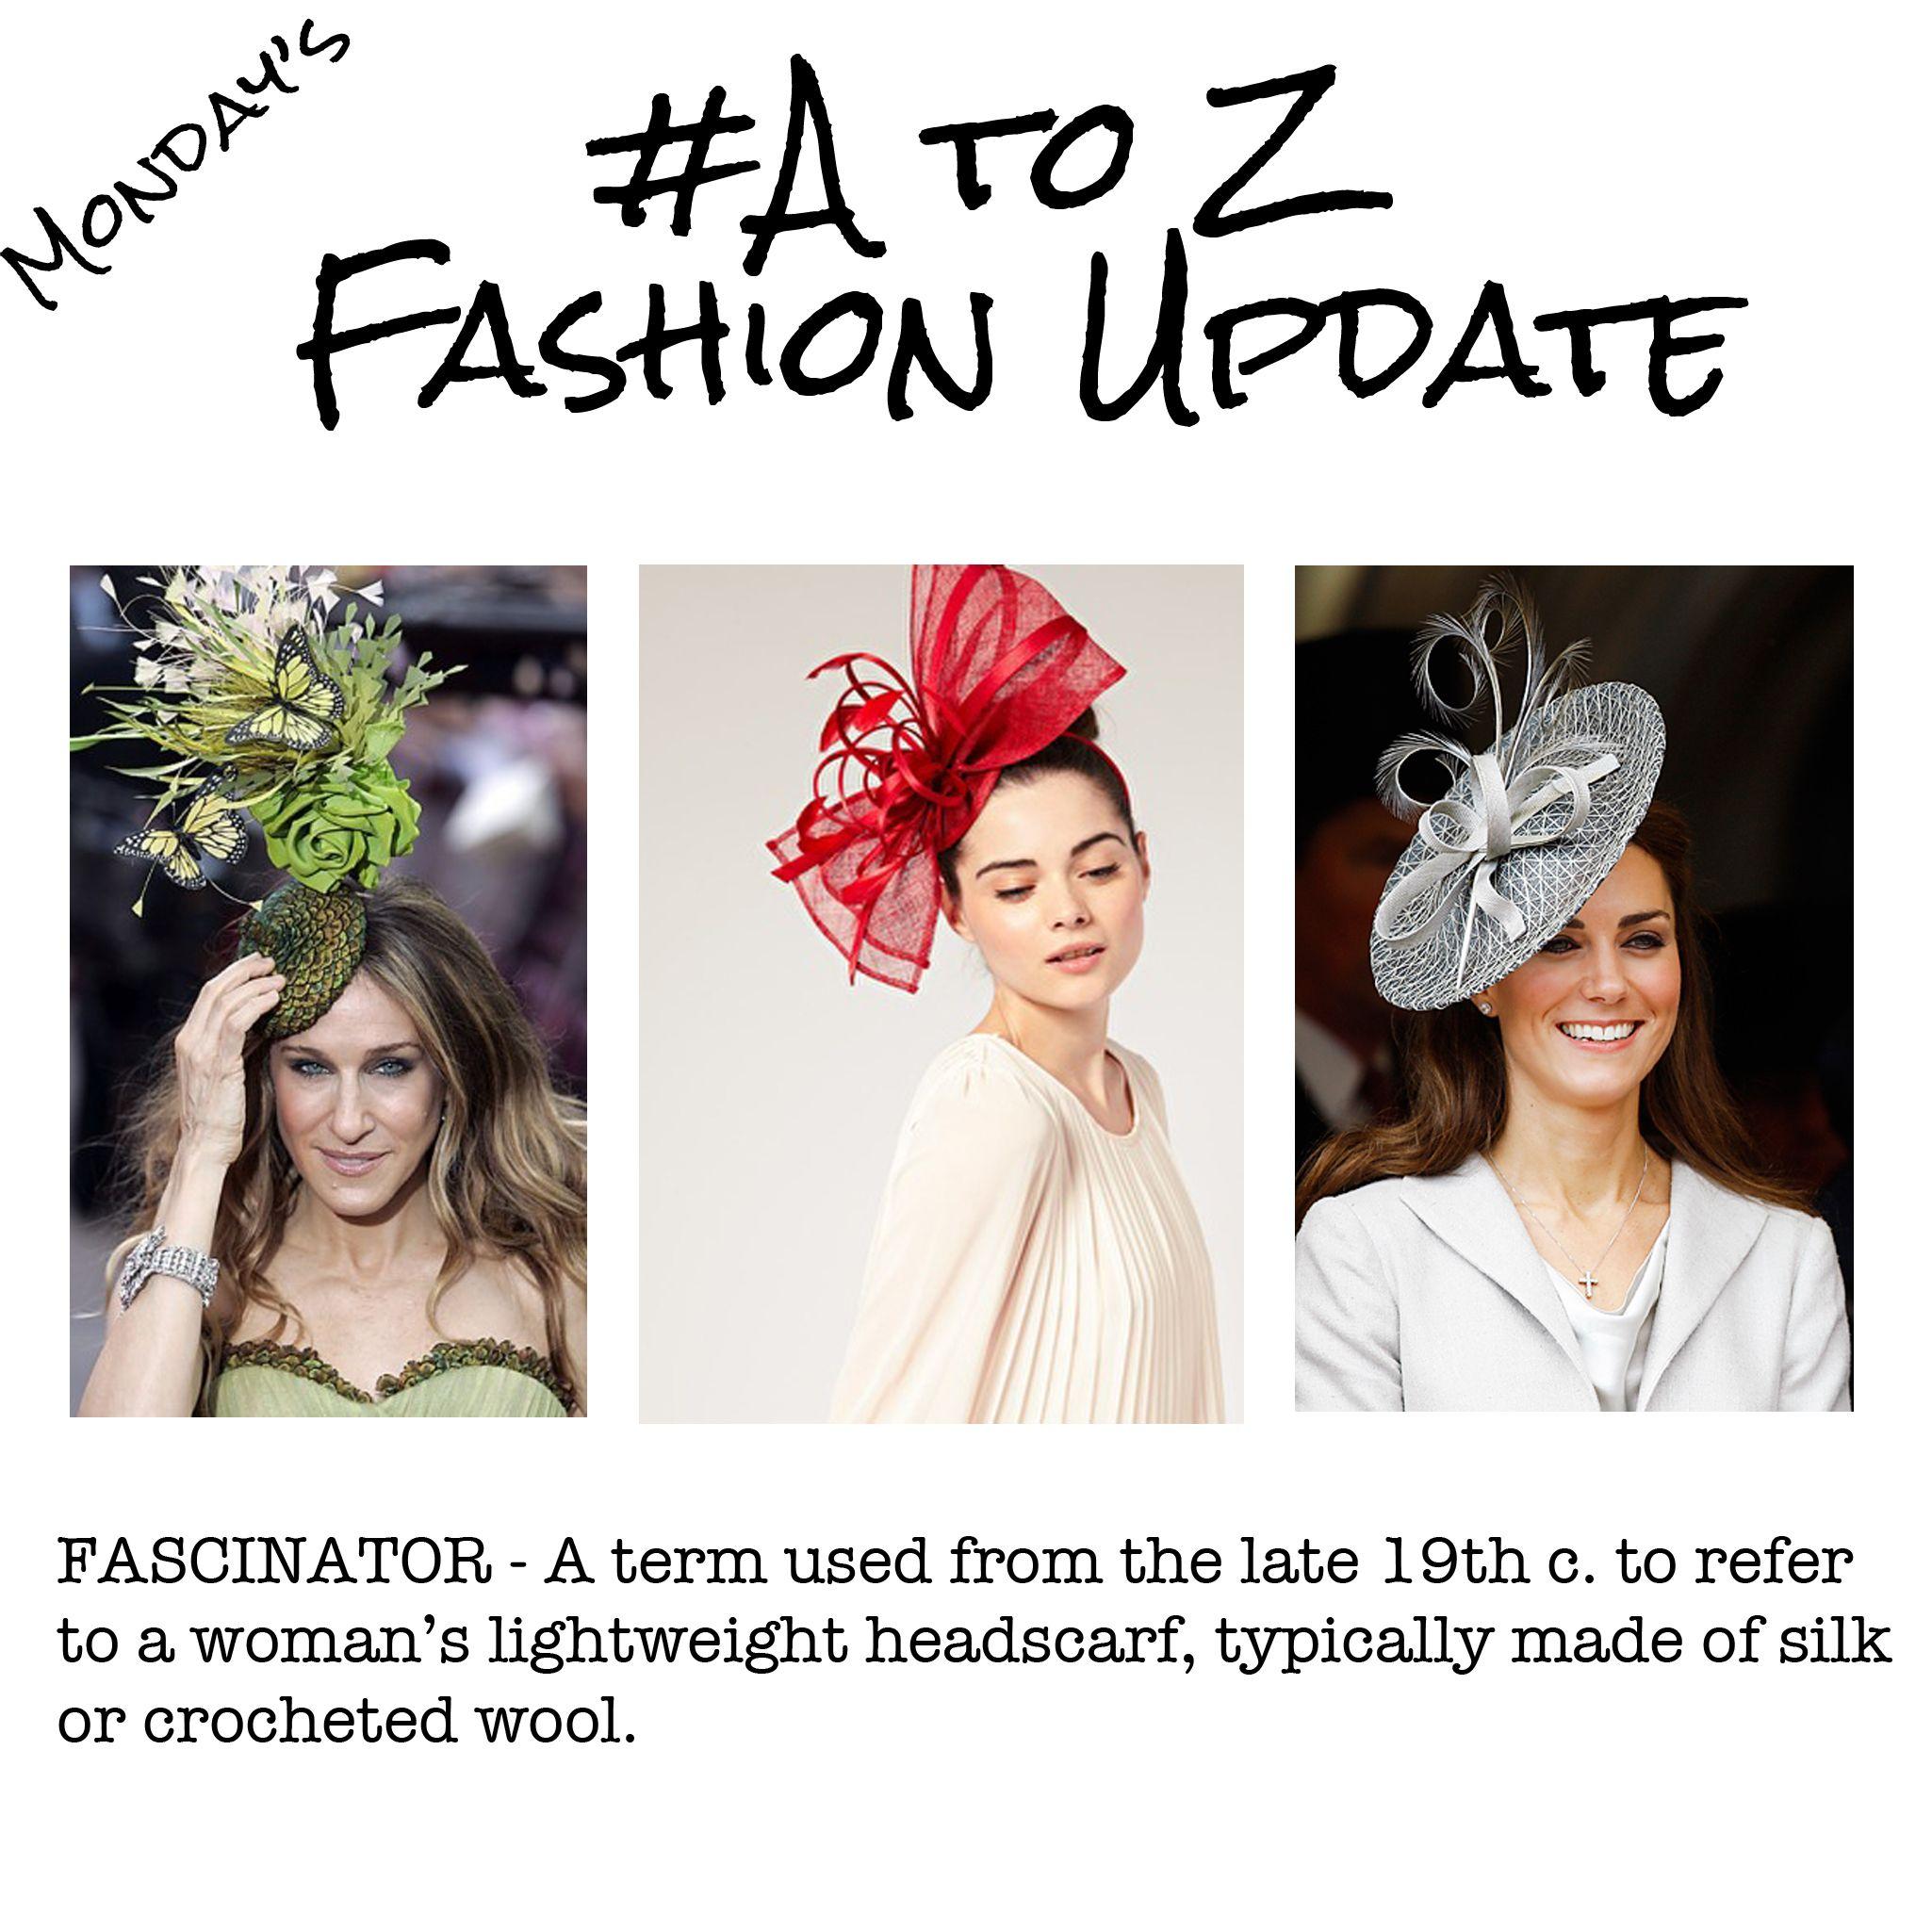 A-Z Fashion Update - Fascinator